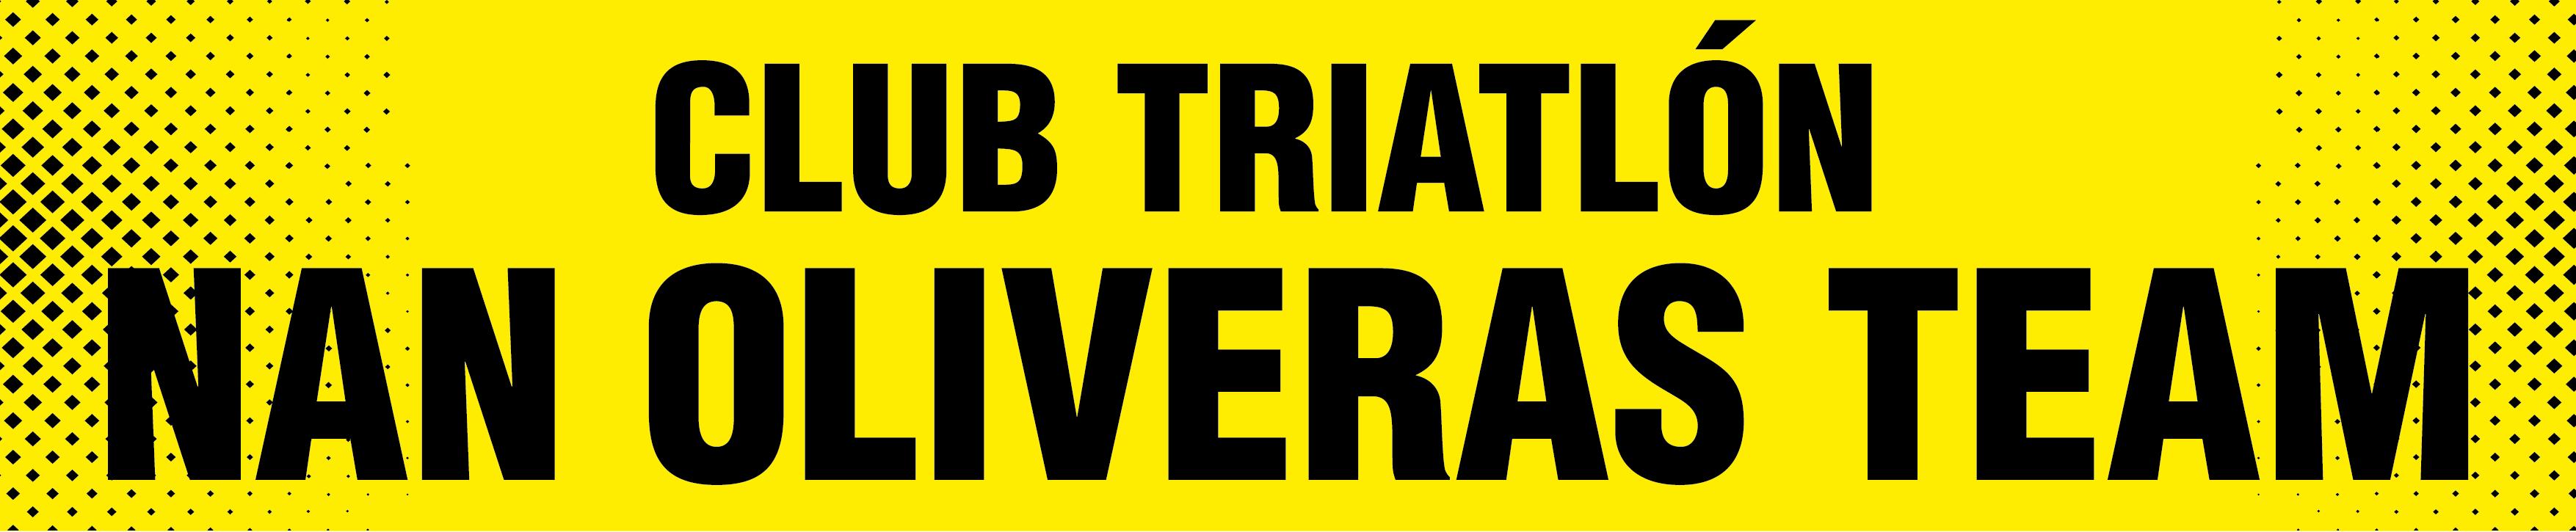 Club triatlón<br/><span>Nan Oliveras Team</span>